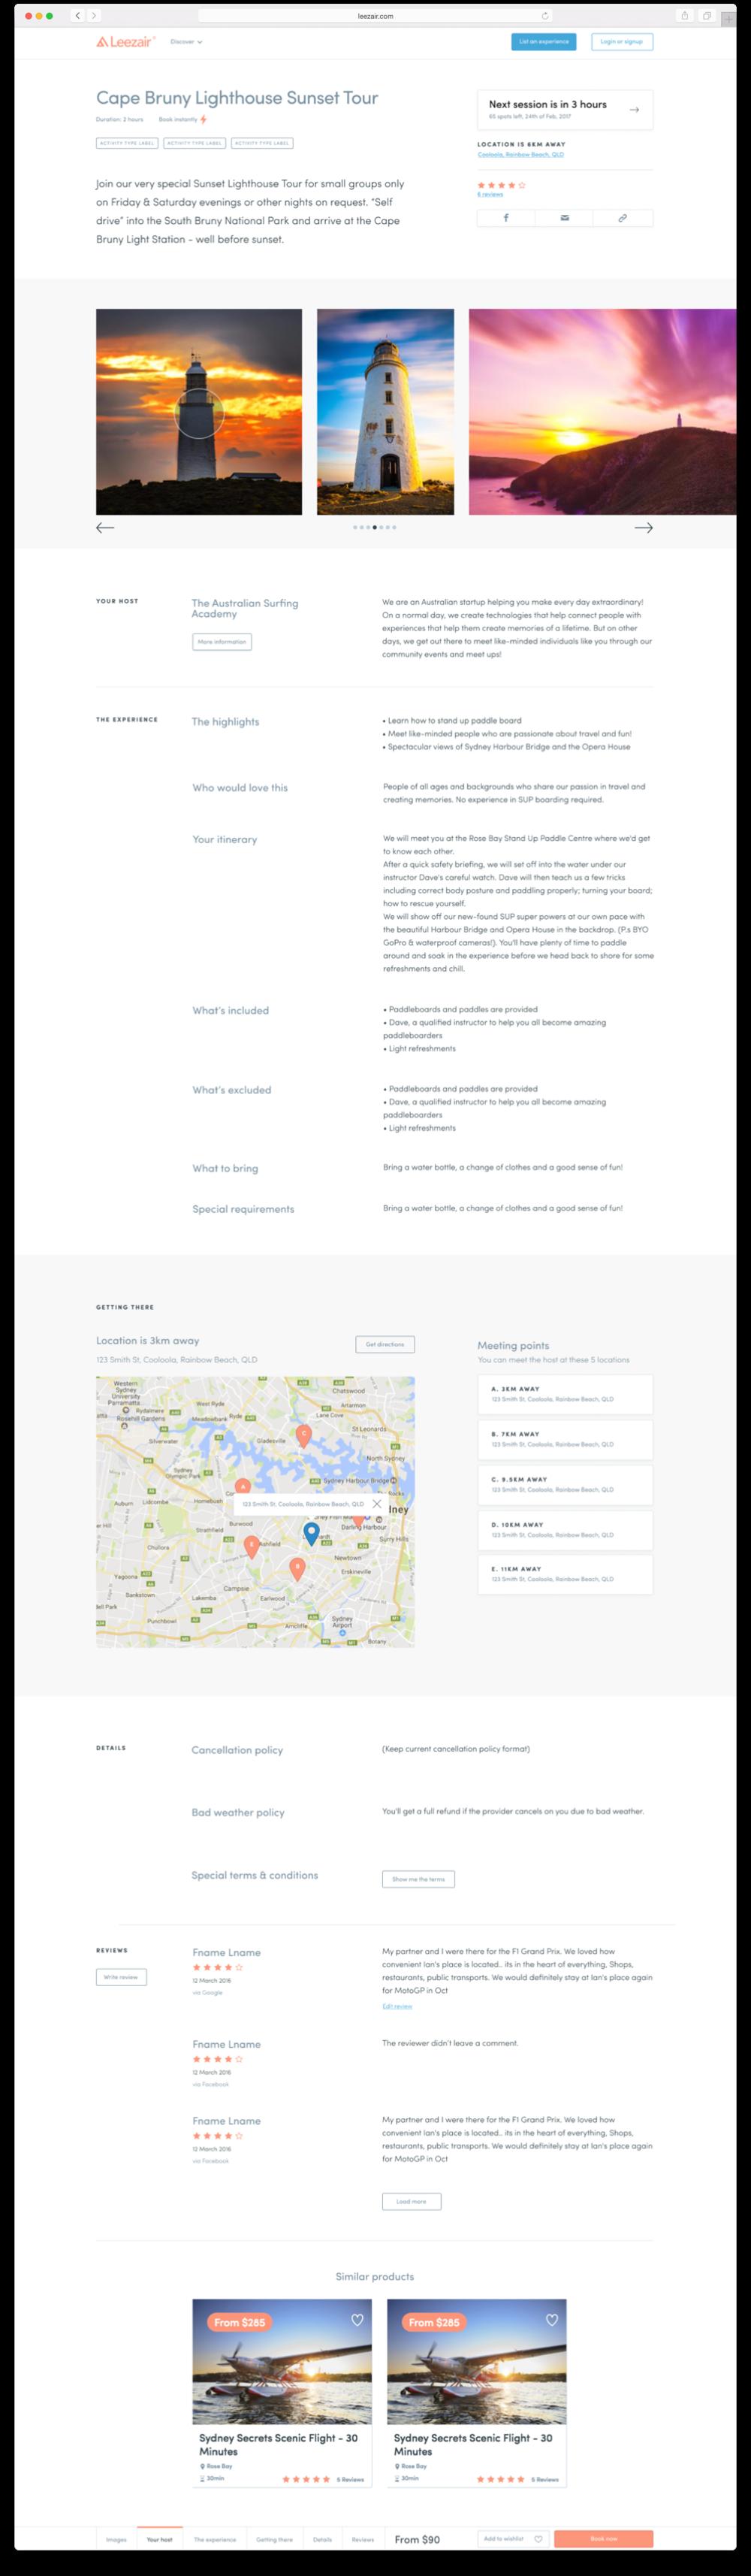 leezair-site-activity-browser.png